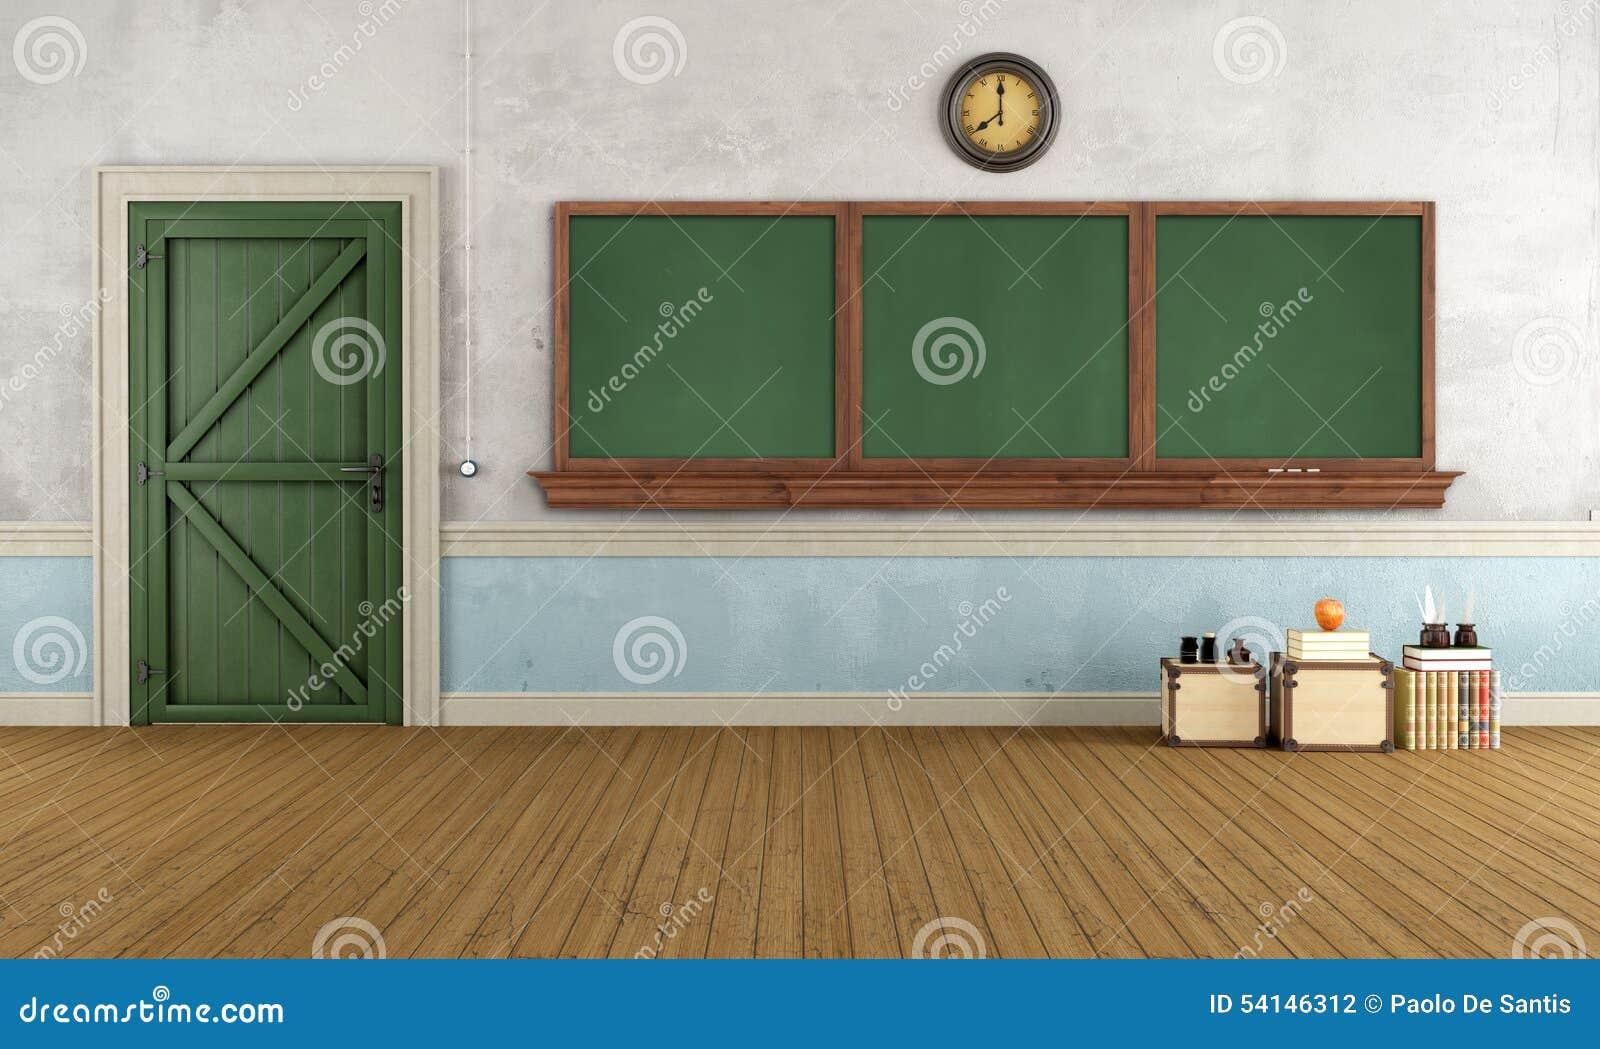 Cartoon classroom door - Empty Retro Classroom